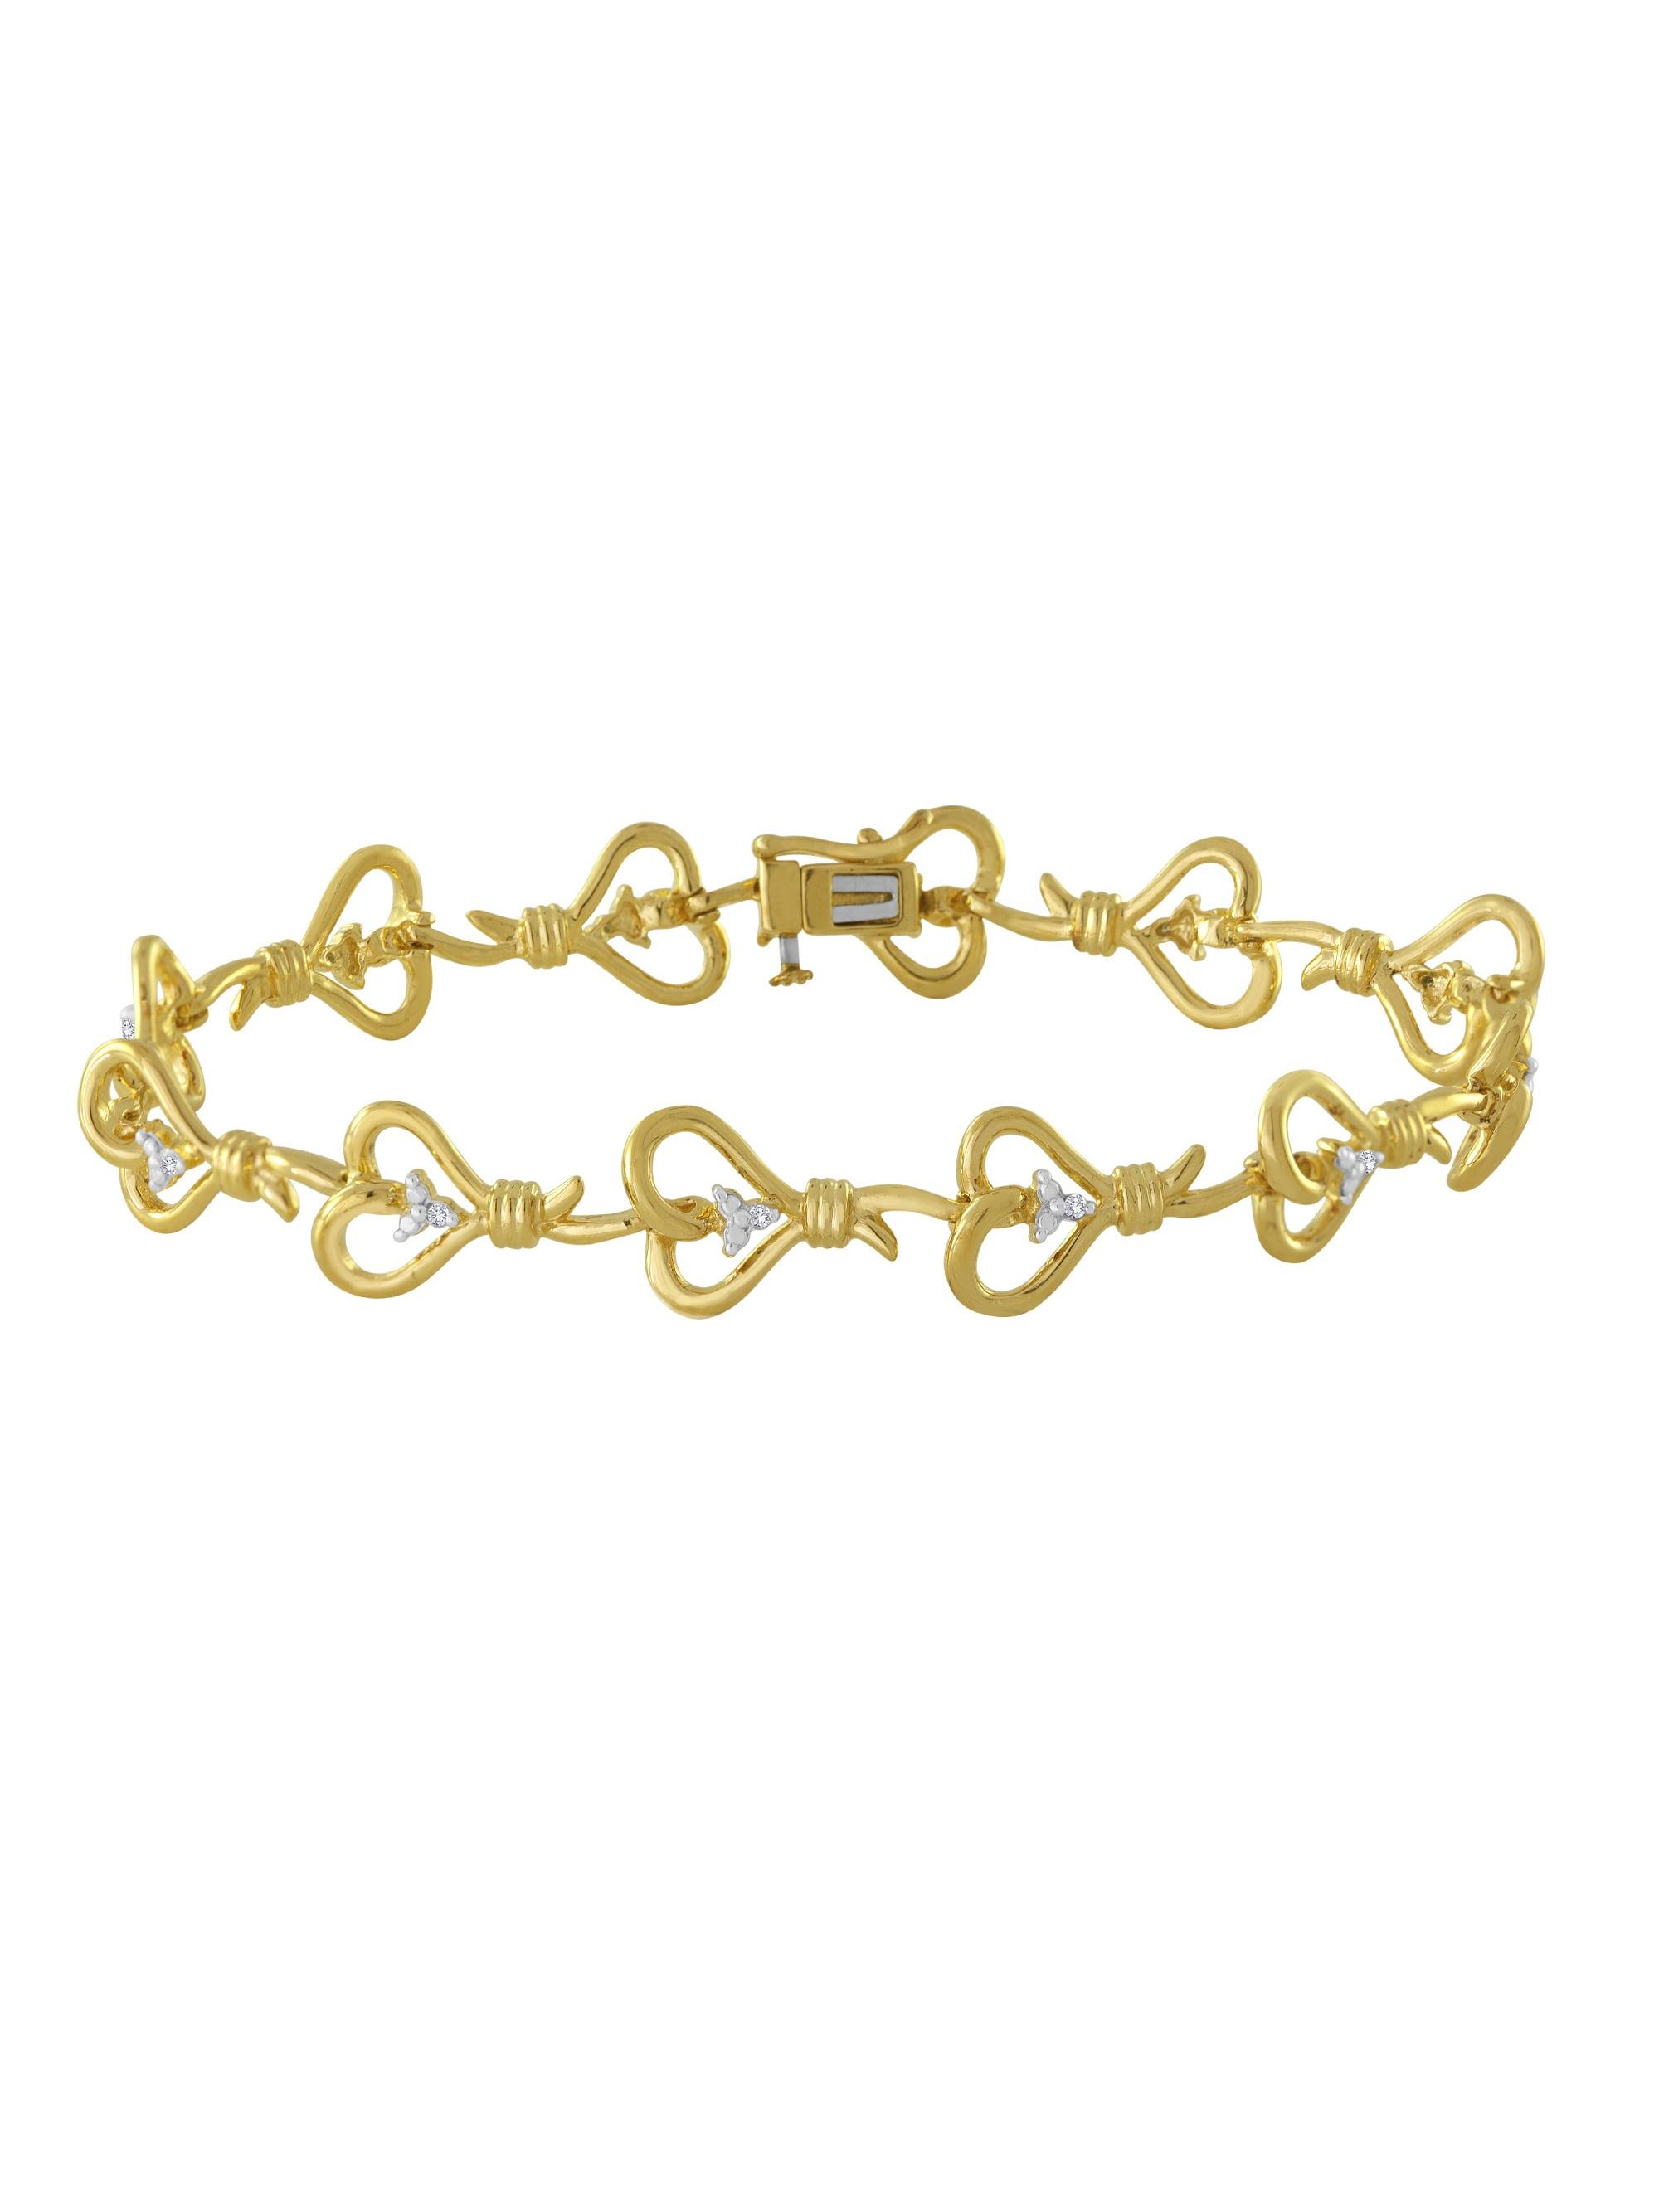 "Knots of Love 14kt Yellow Gold over Sterling Silver 1/10 Carat T.W. Diamond Bracelet, 7.5"""